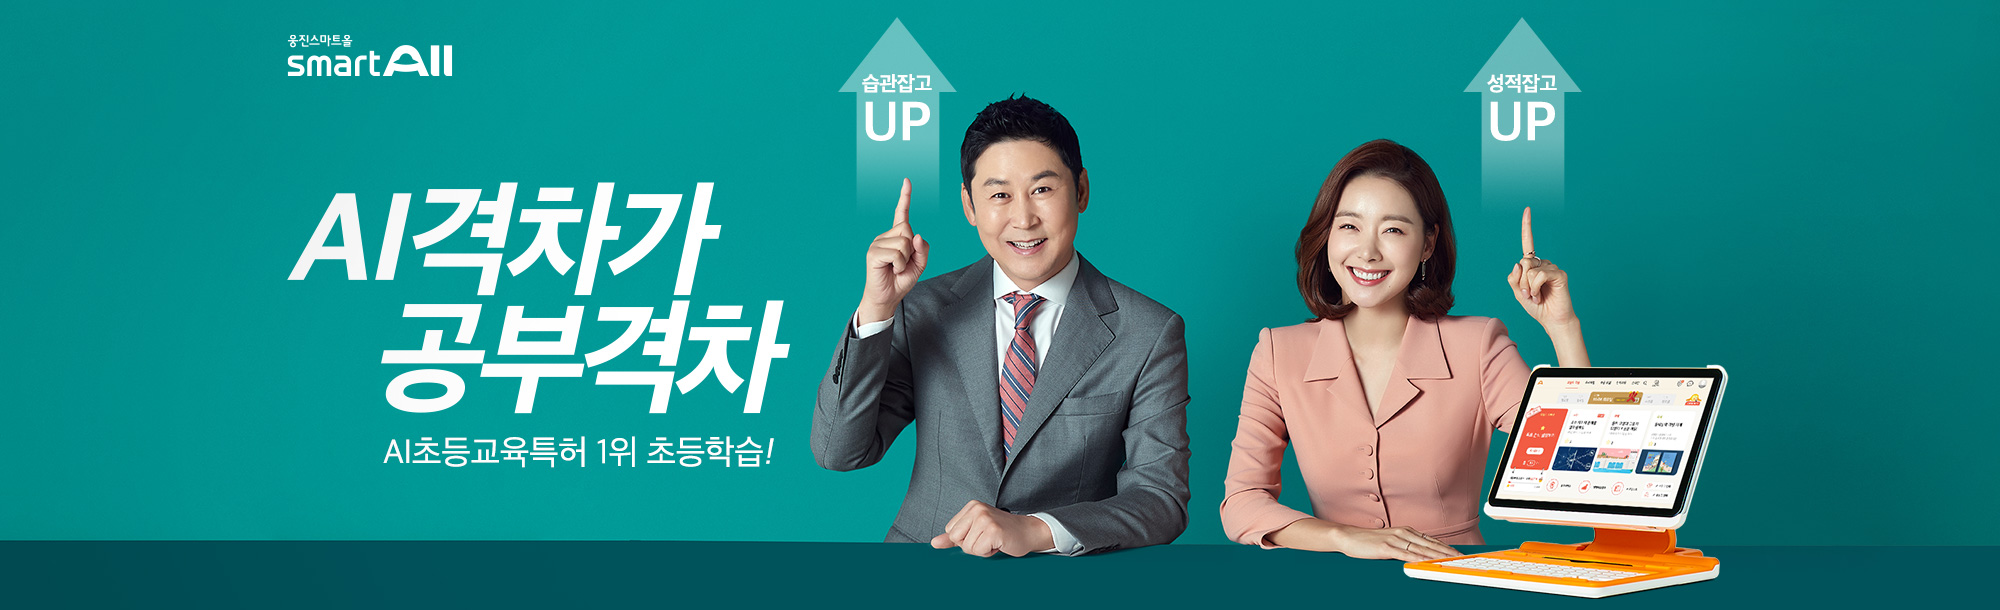 2021_TV CF 캠페인(신동엽, 소이현)